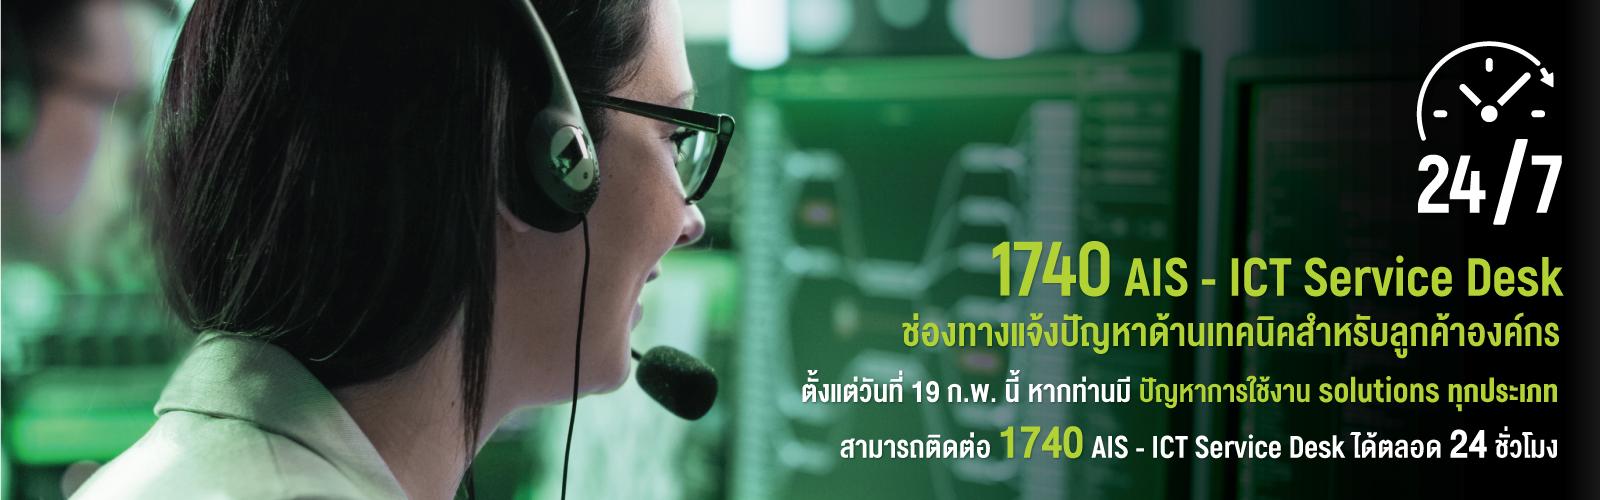 ICT 24/7